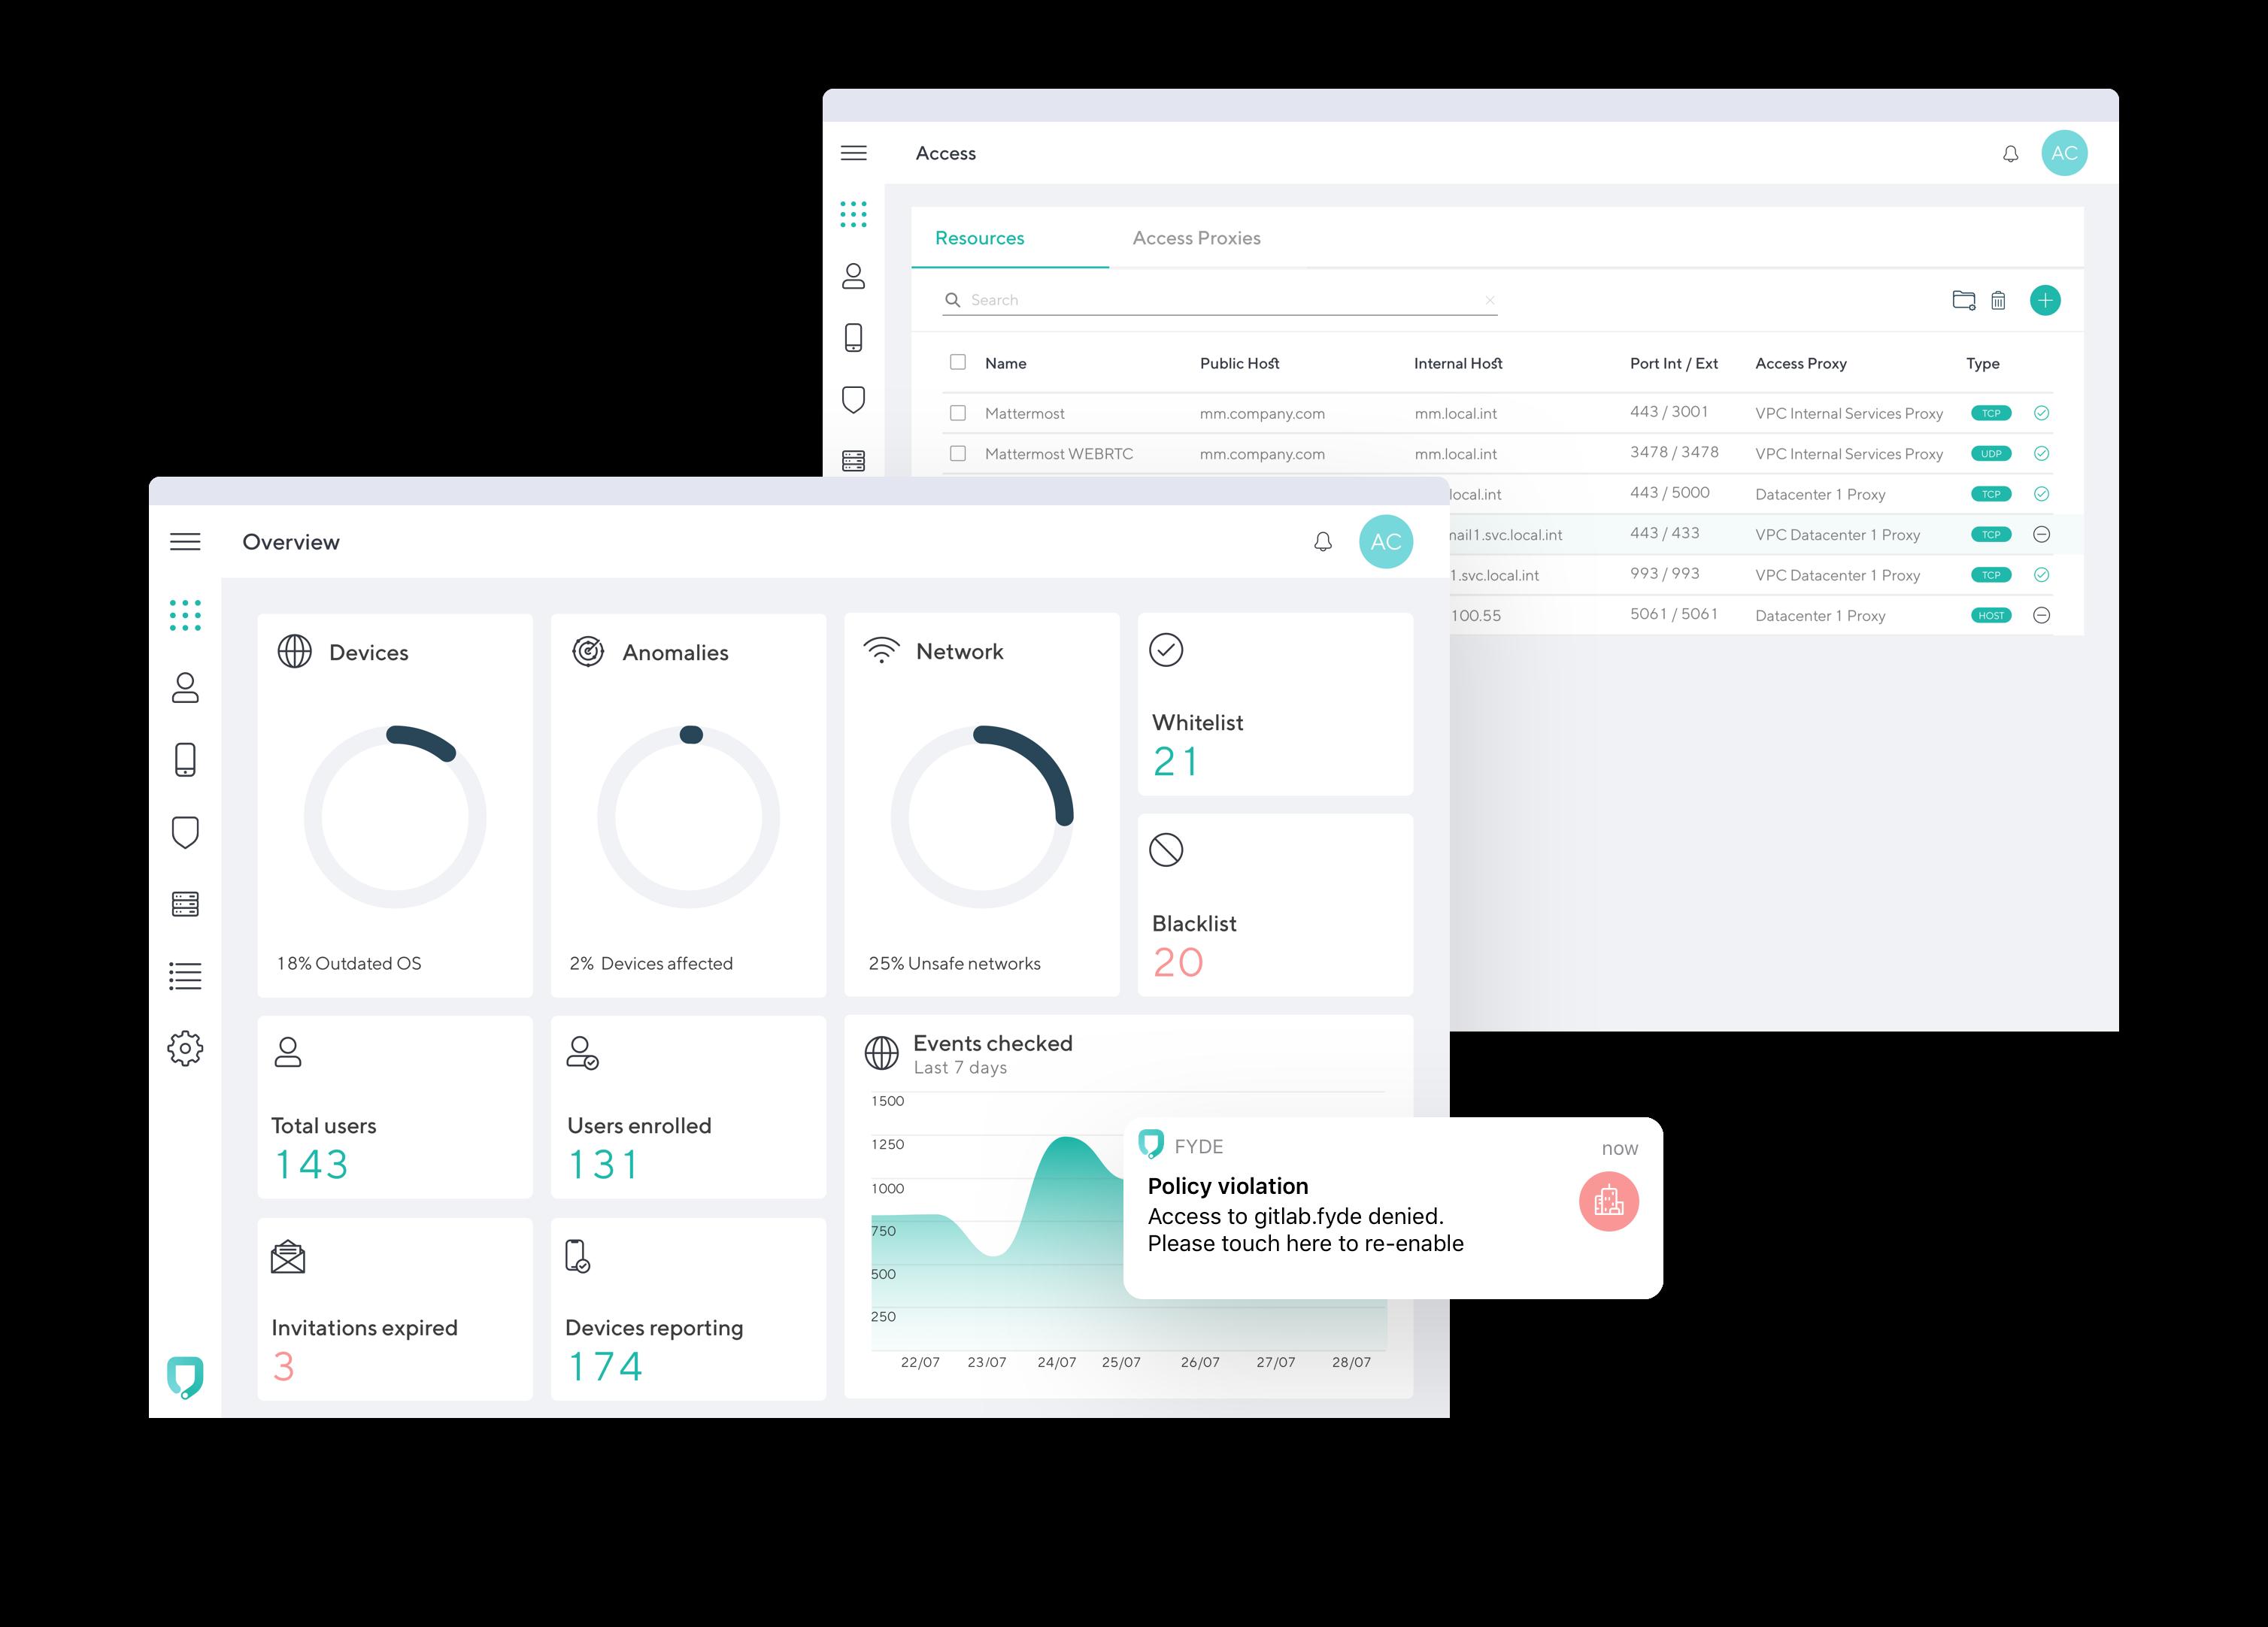 Enterprise_Desktop